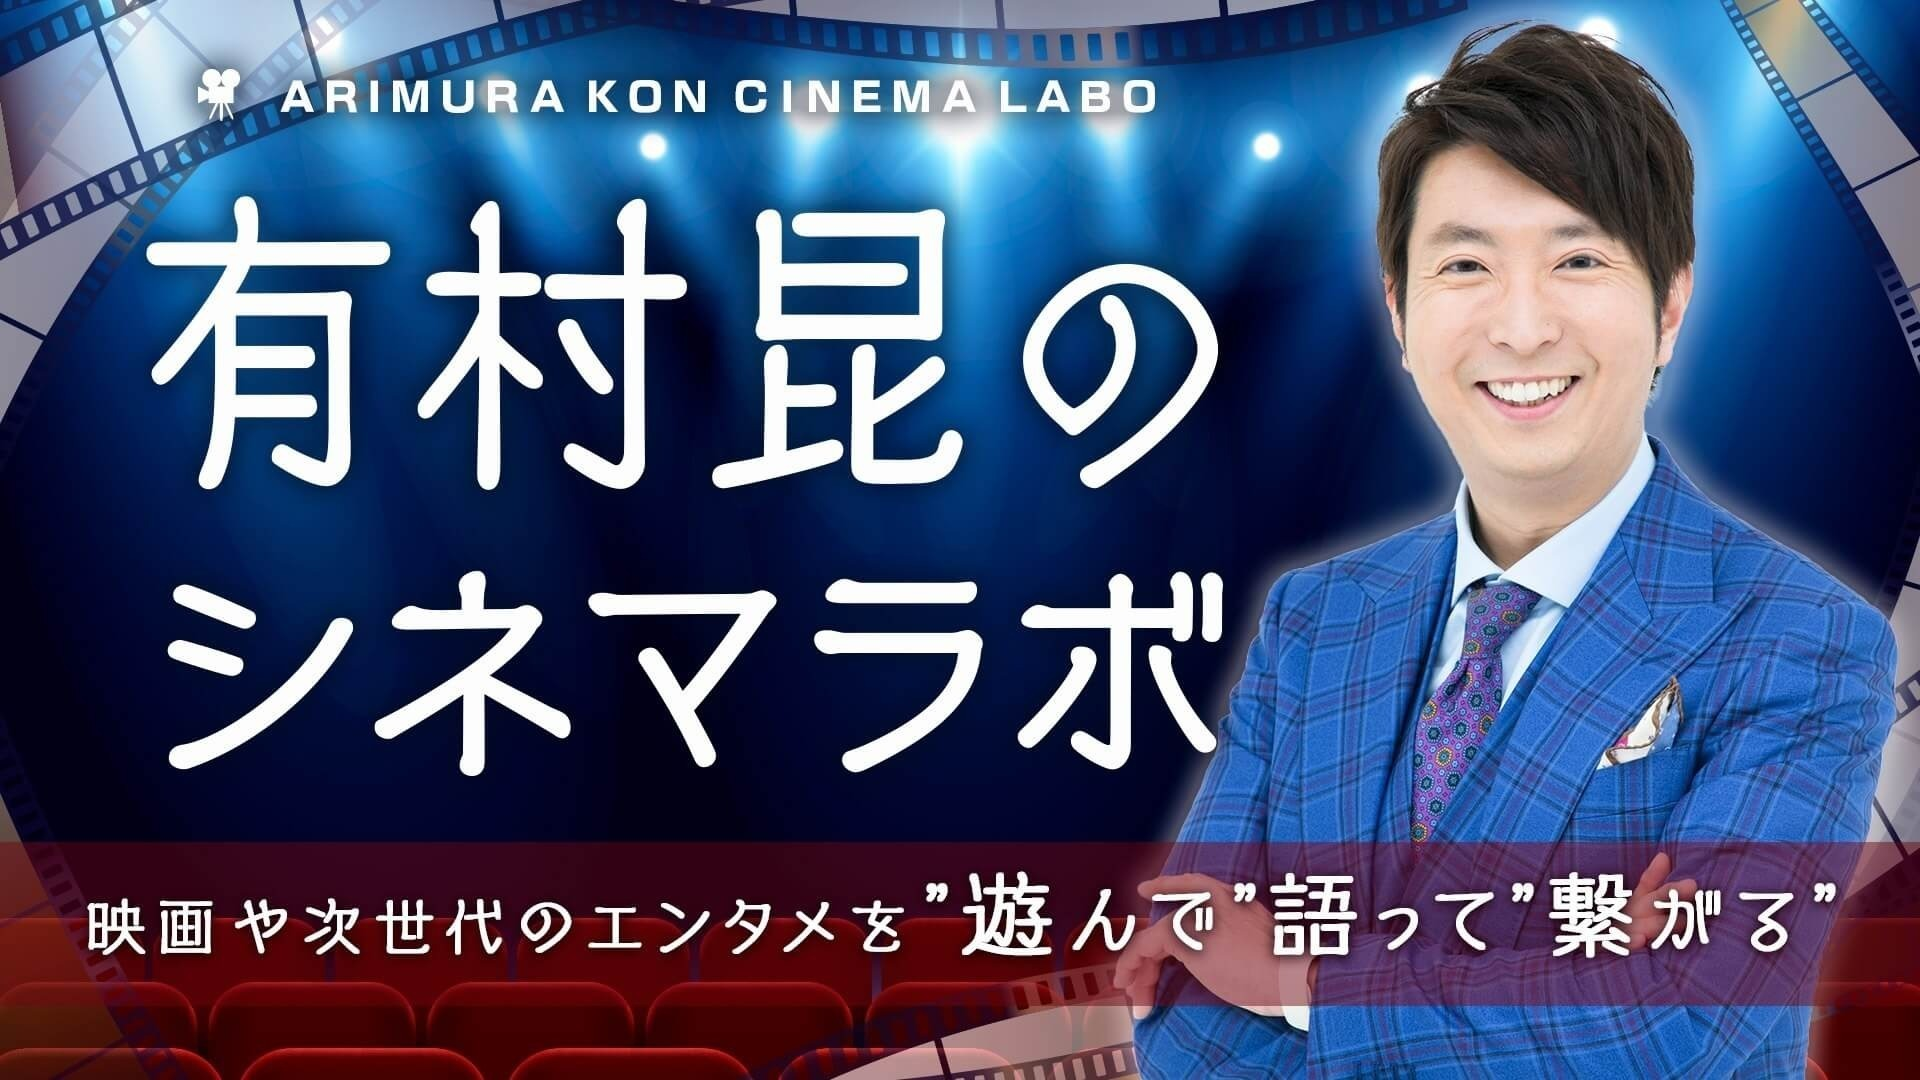 CINEMA LABO  by kon arimura